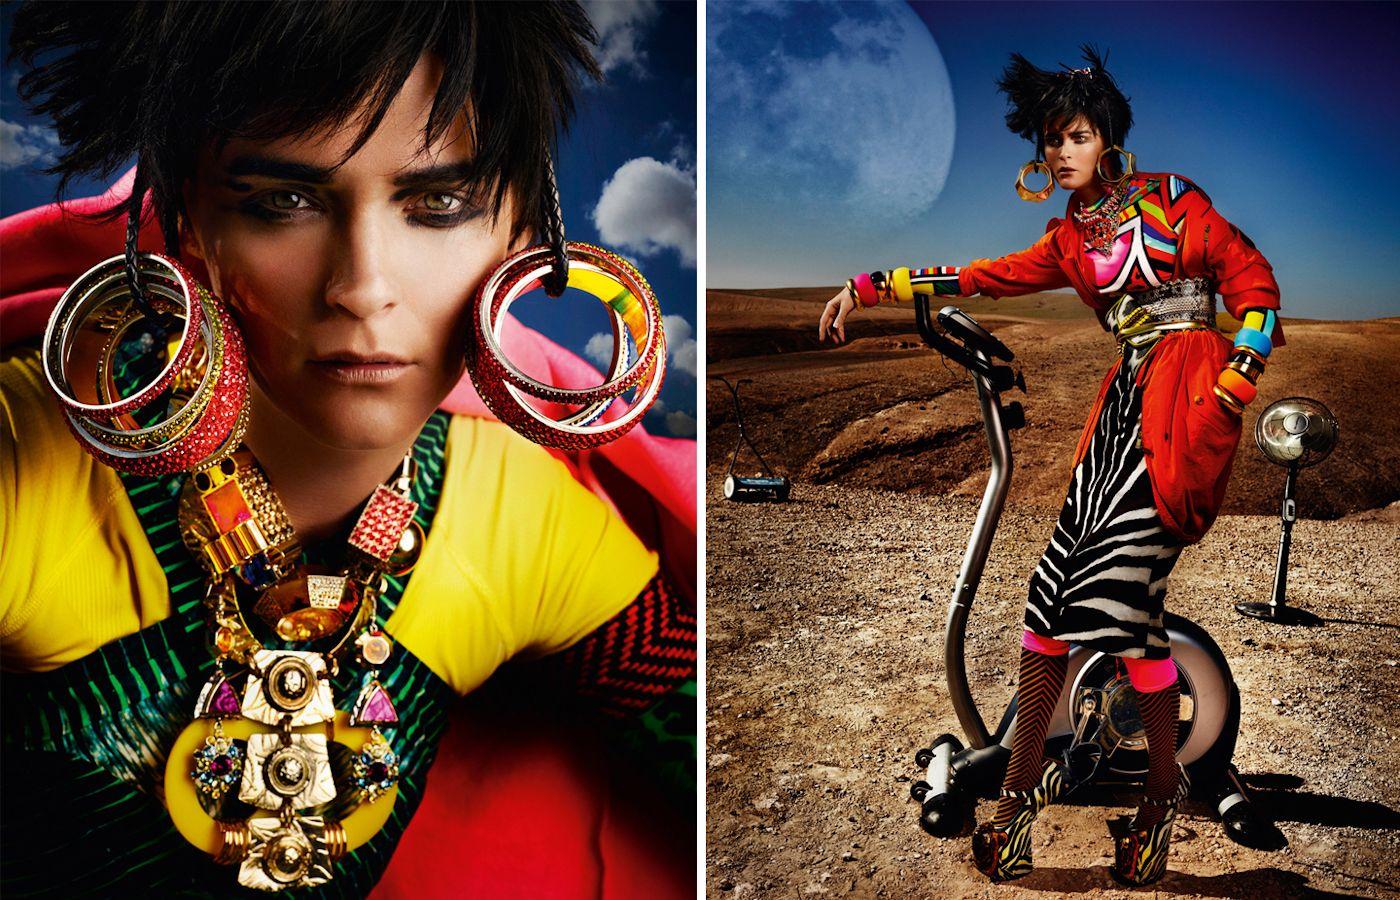 Carmen Kass by Mario Testino for Vogue UK May 2012.